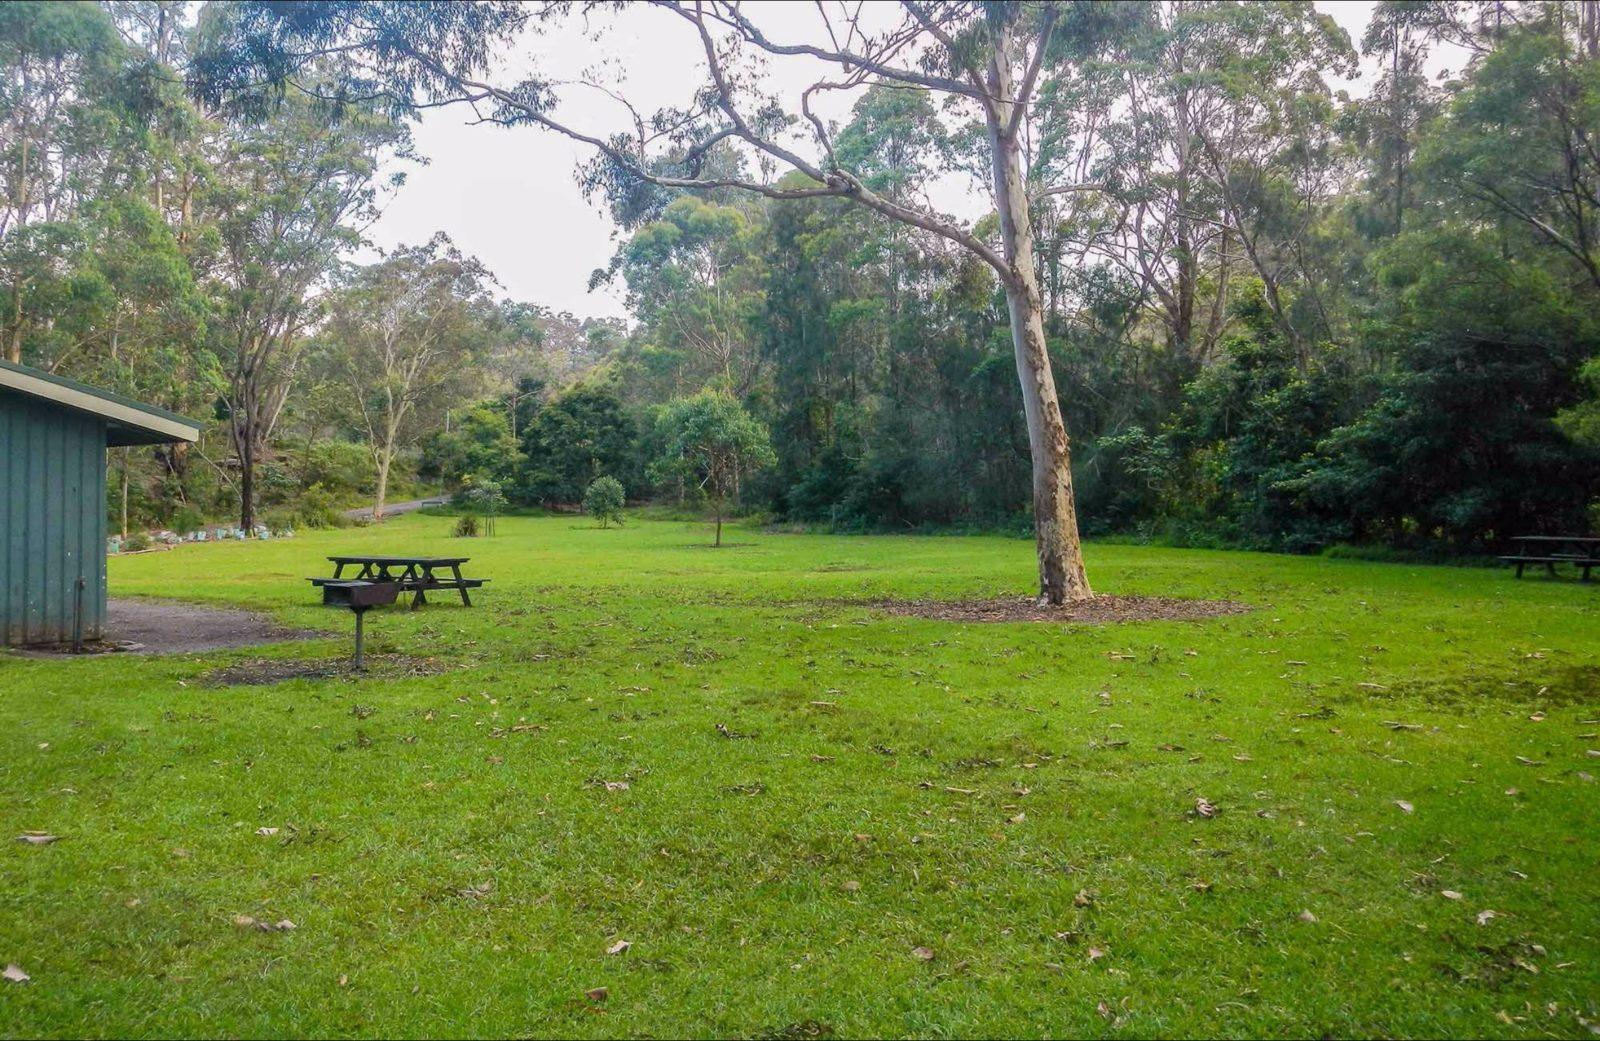 Haynes Flat picnic area